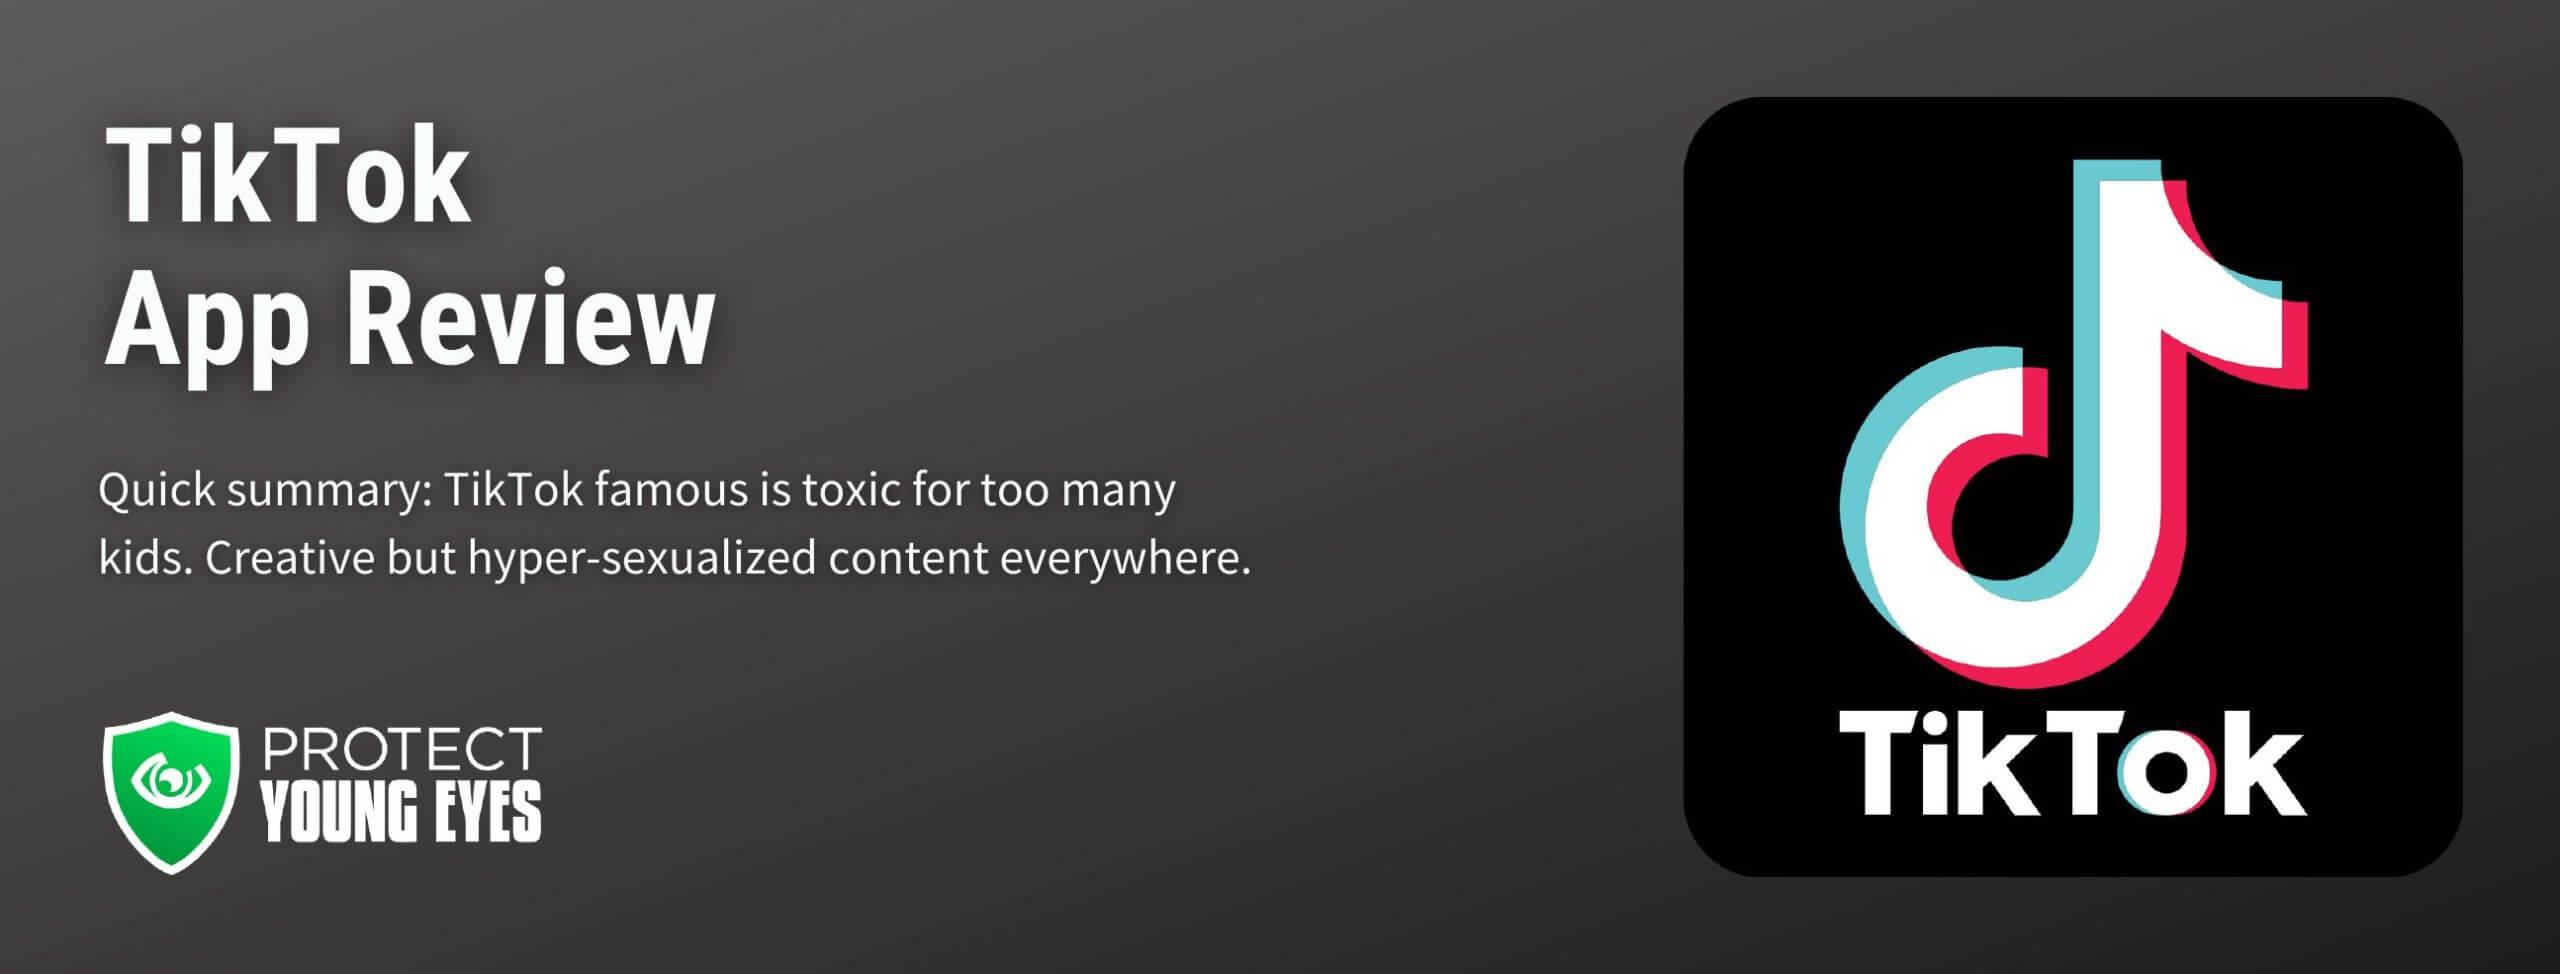 TikTok App Review - is it safe?